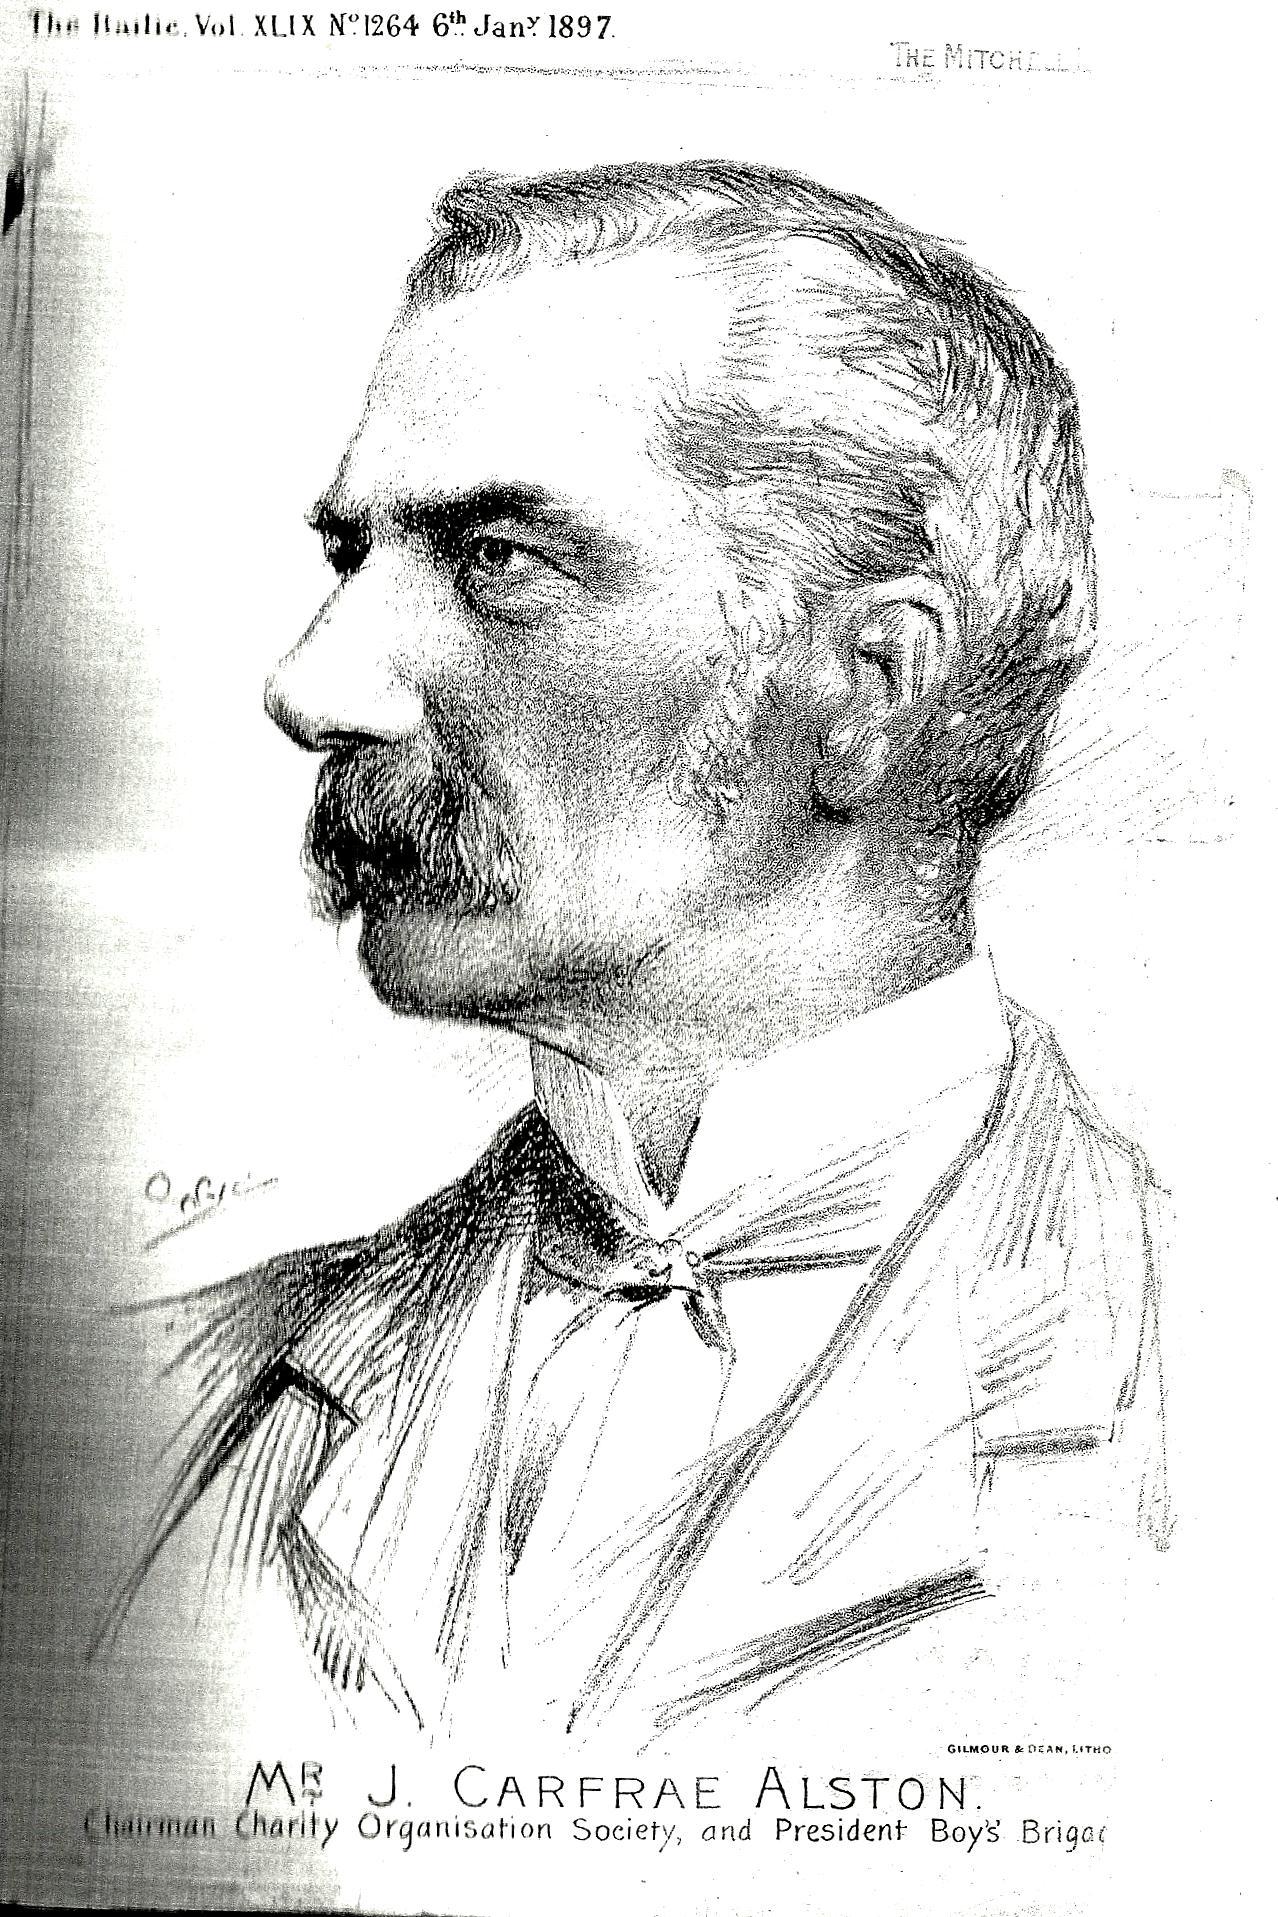 Alston 001 Alston portrait